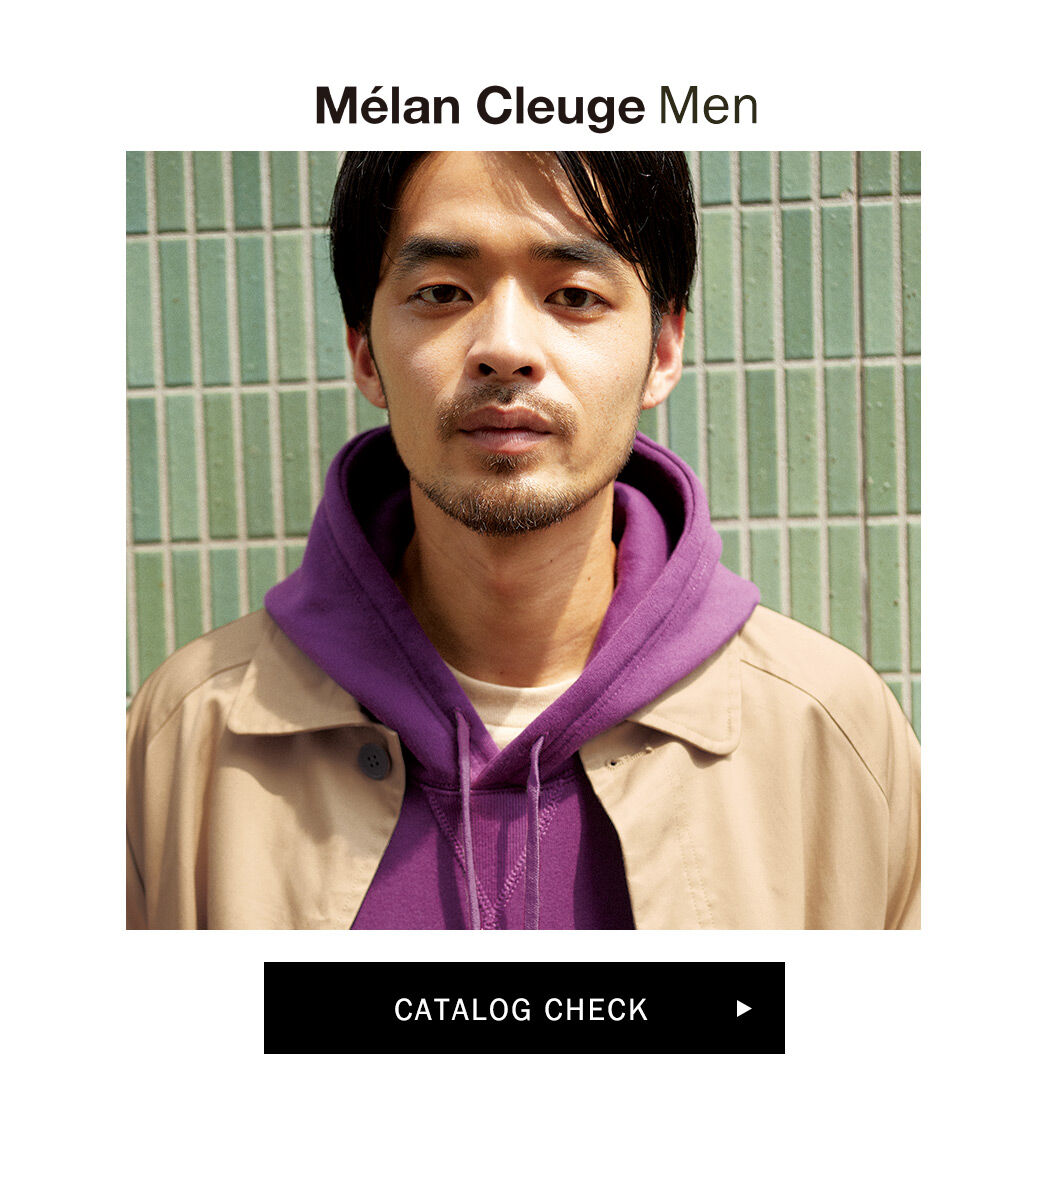 Melan cleuge秋カタログ,メランクルージュメンズ